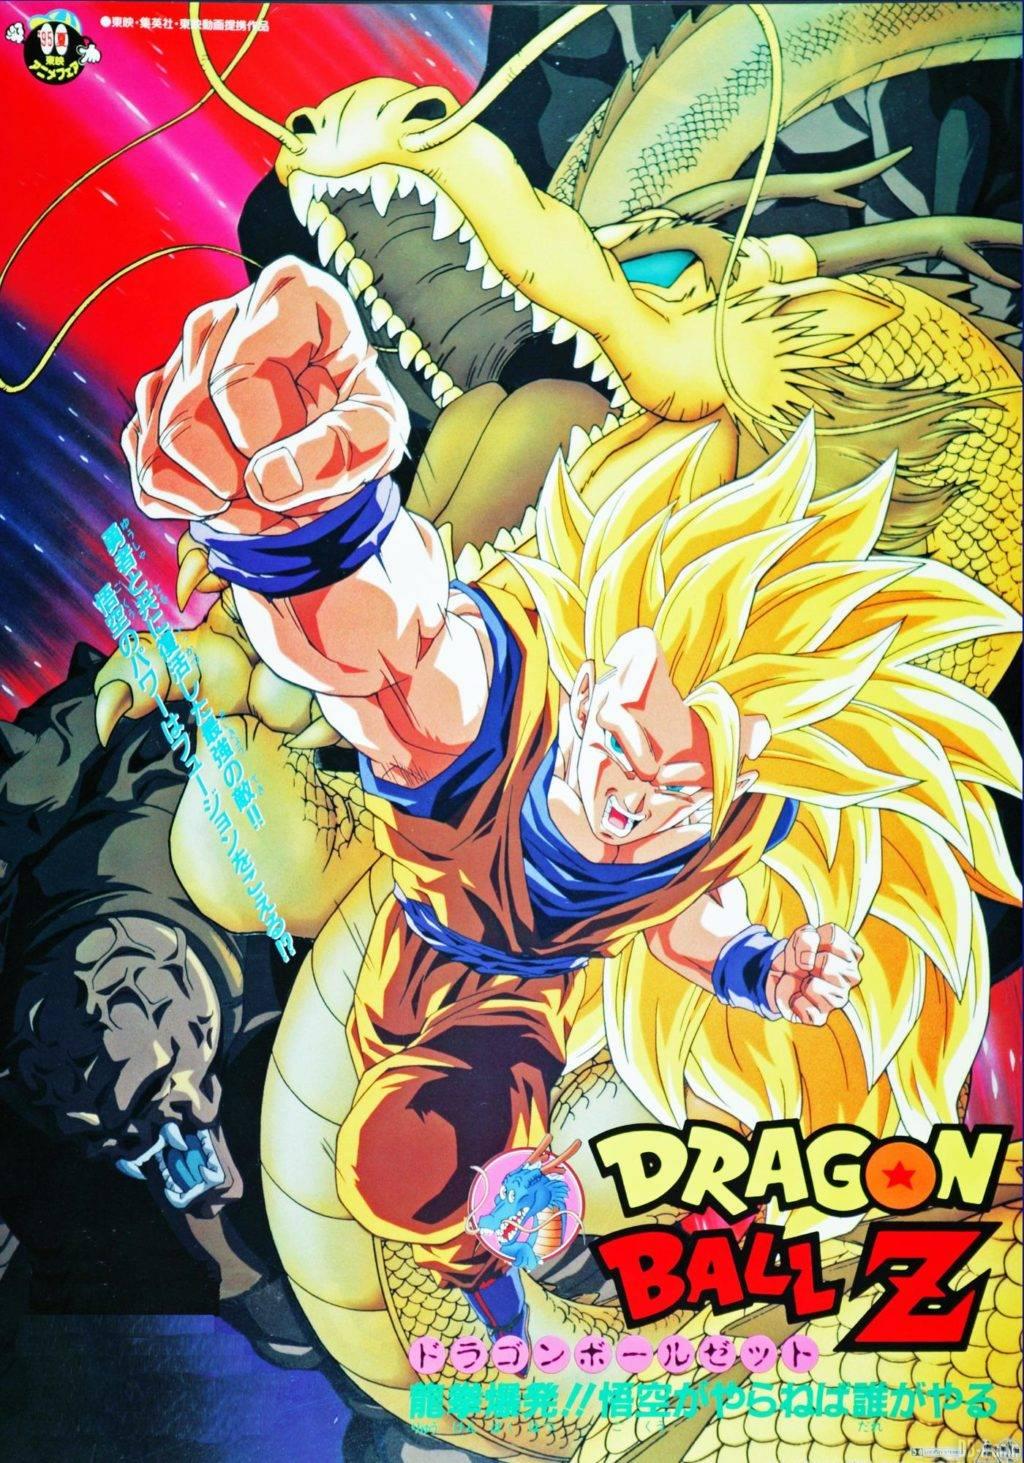 Affiche du film Dragon Ball Z Attaque du Dragon